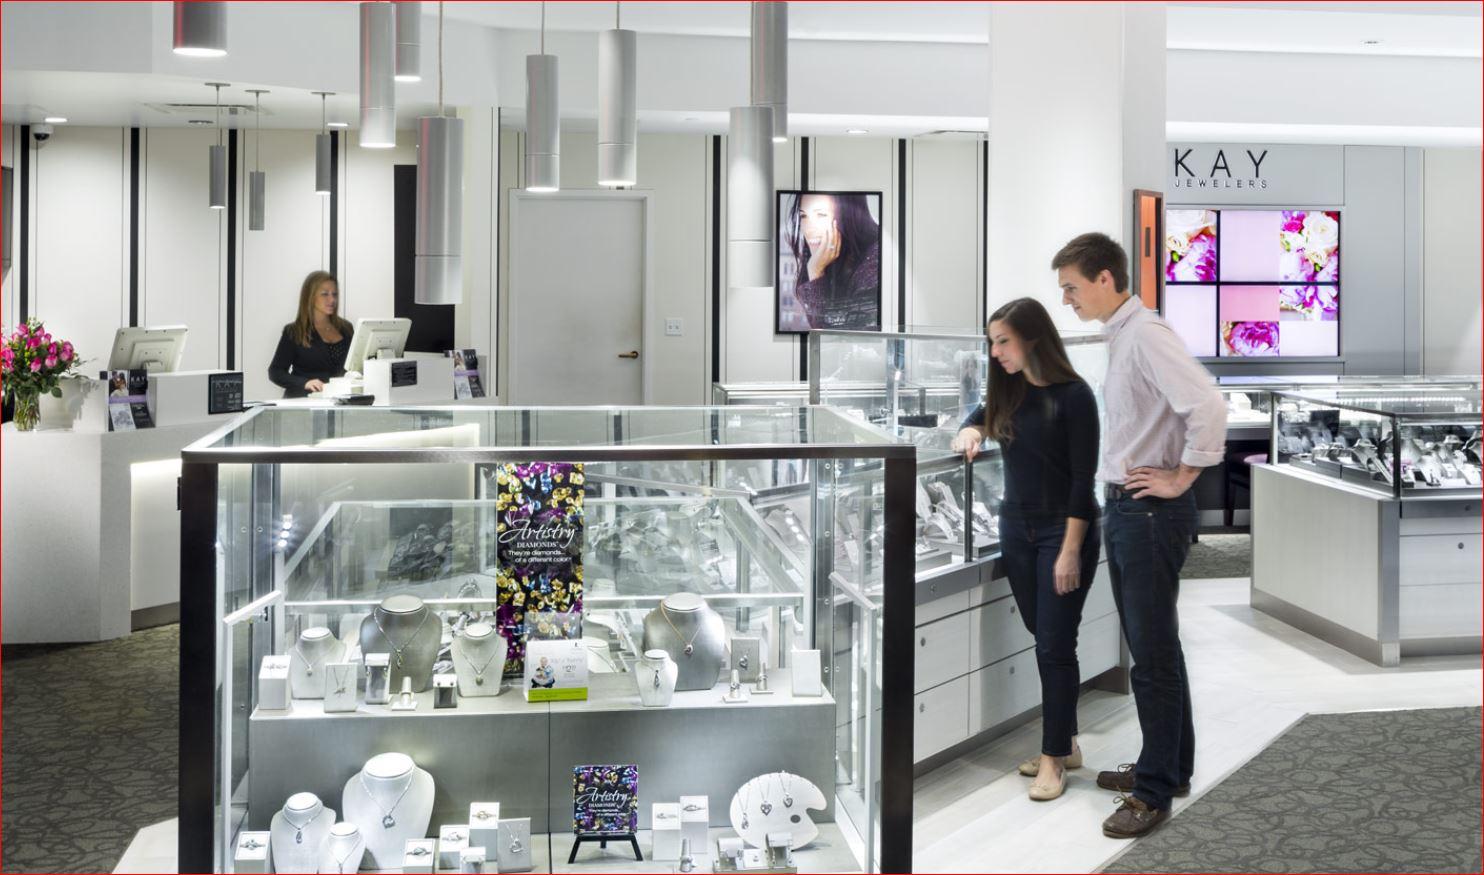 Kay Jewelers Customer Opinion Survey